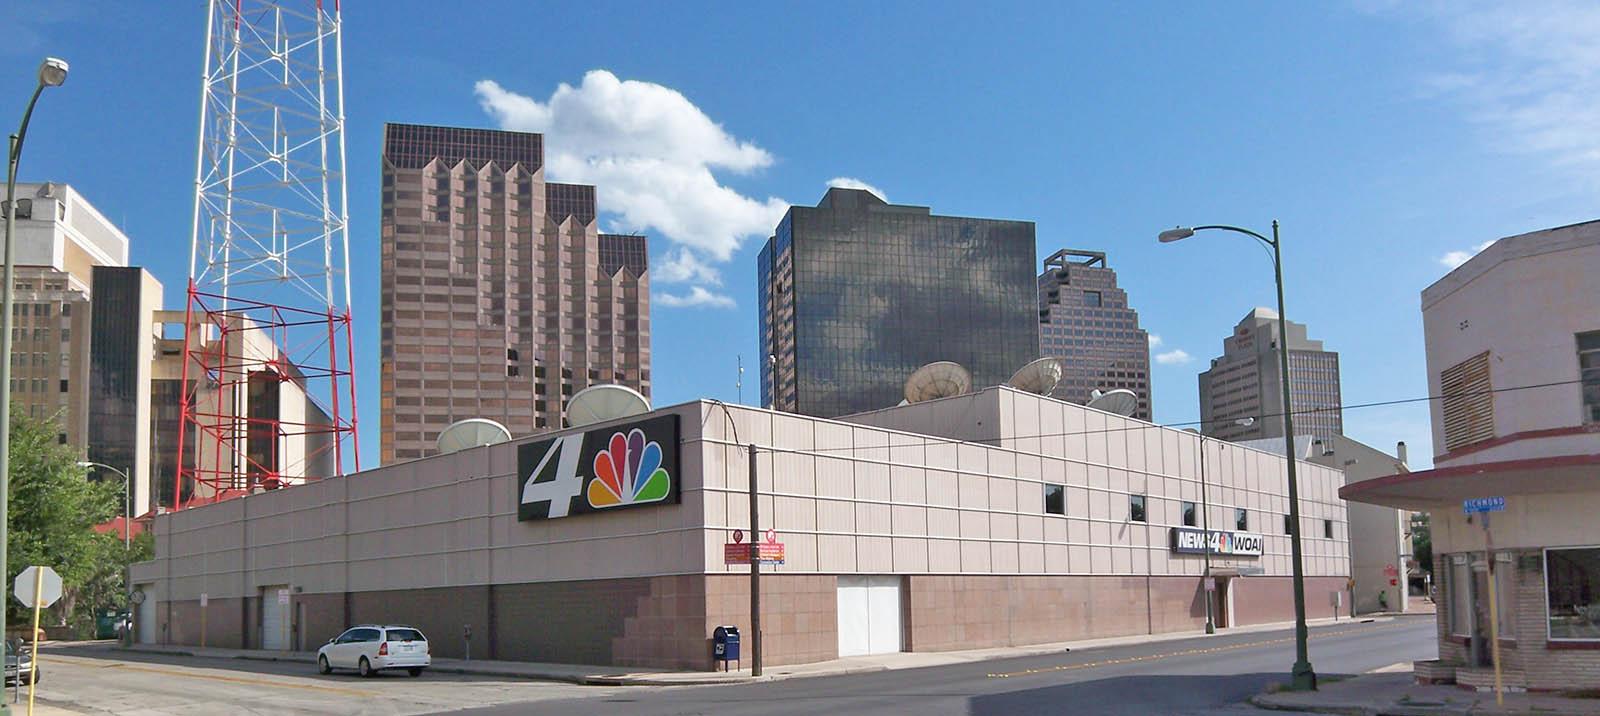 News 4 San Antonio live coverage studio